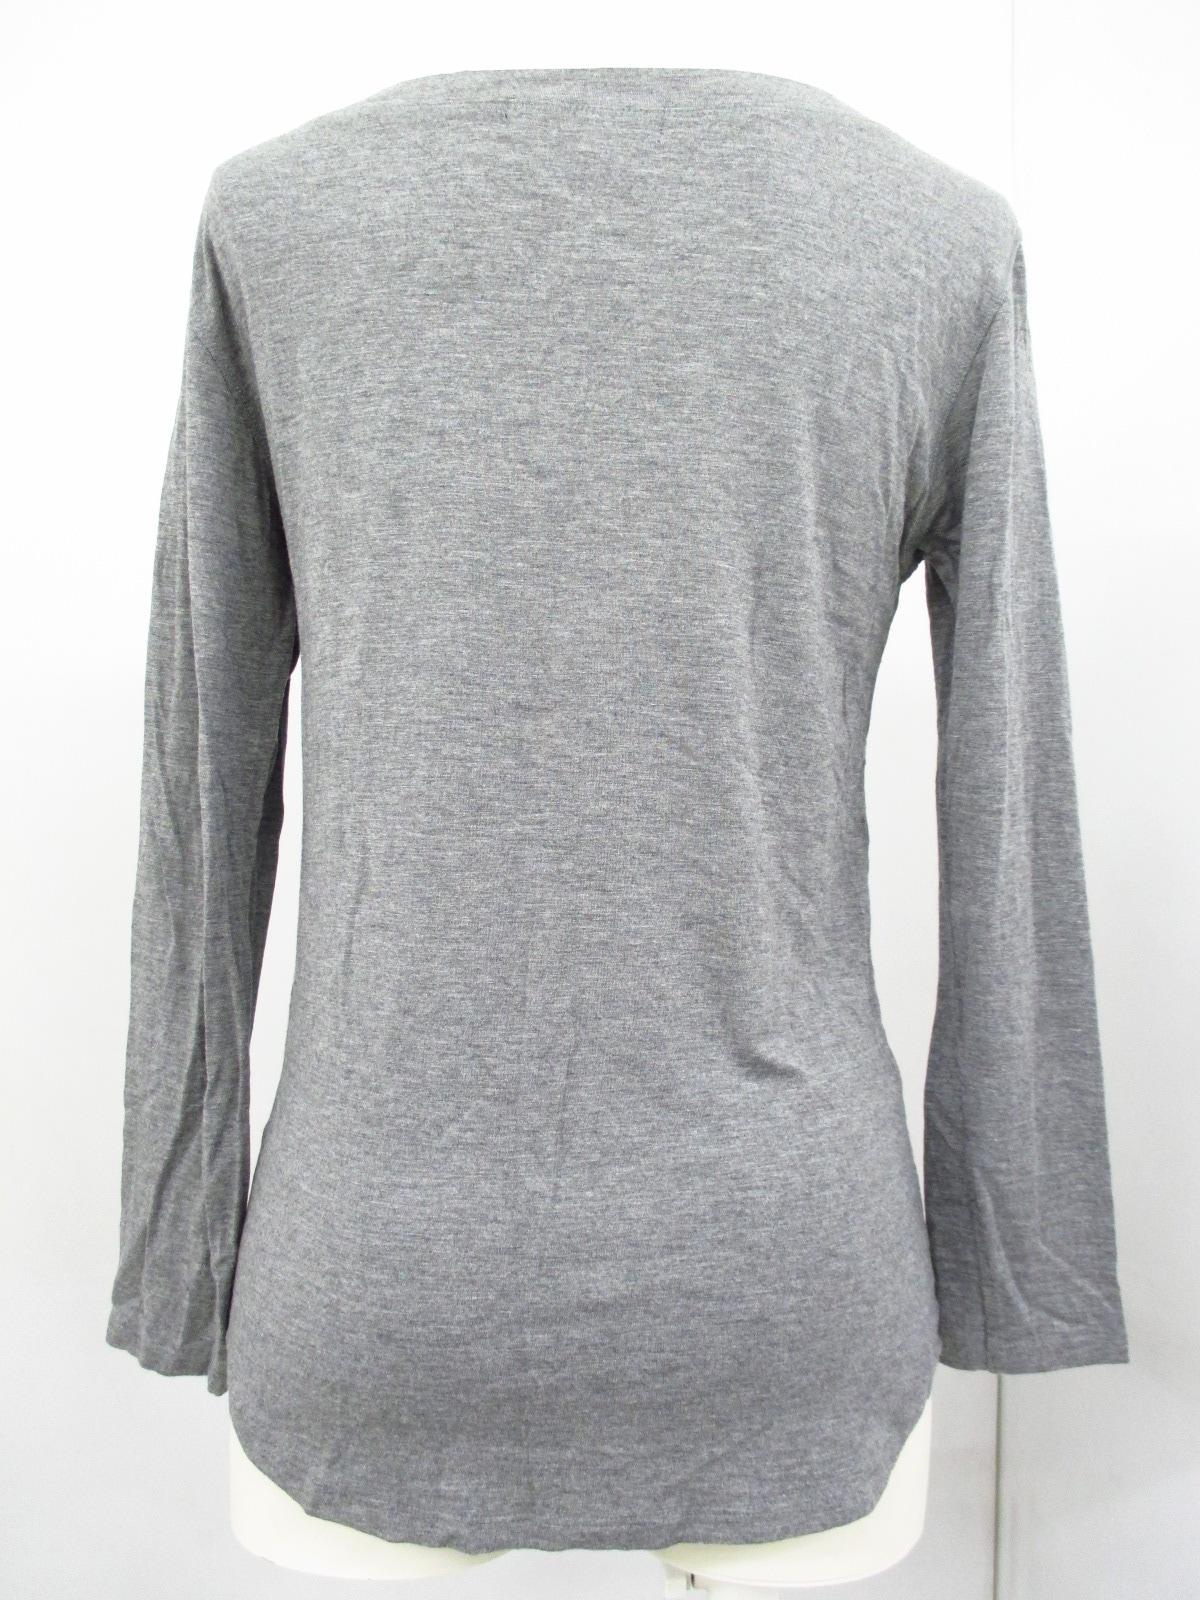 KURIHARA HARUMI(クリハラハルミ)のTシャツ